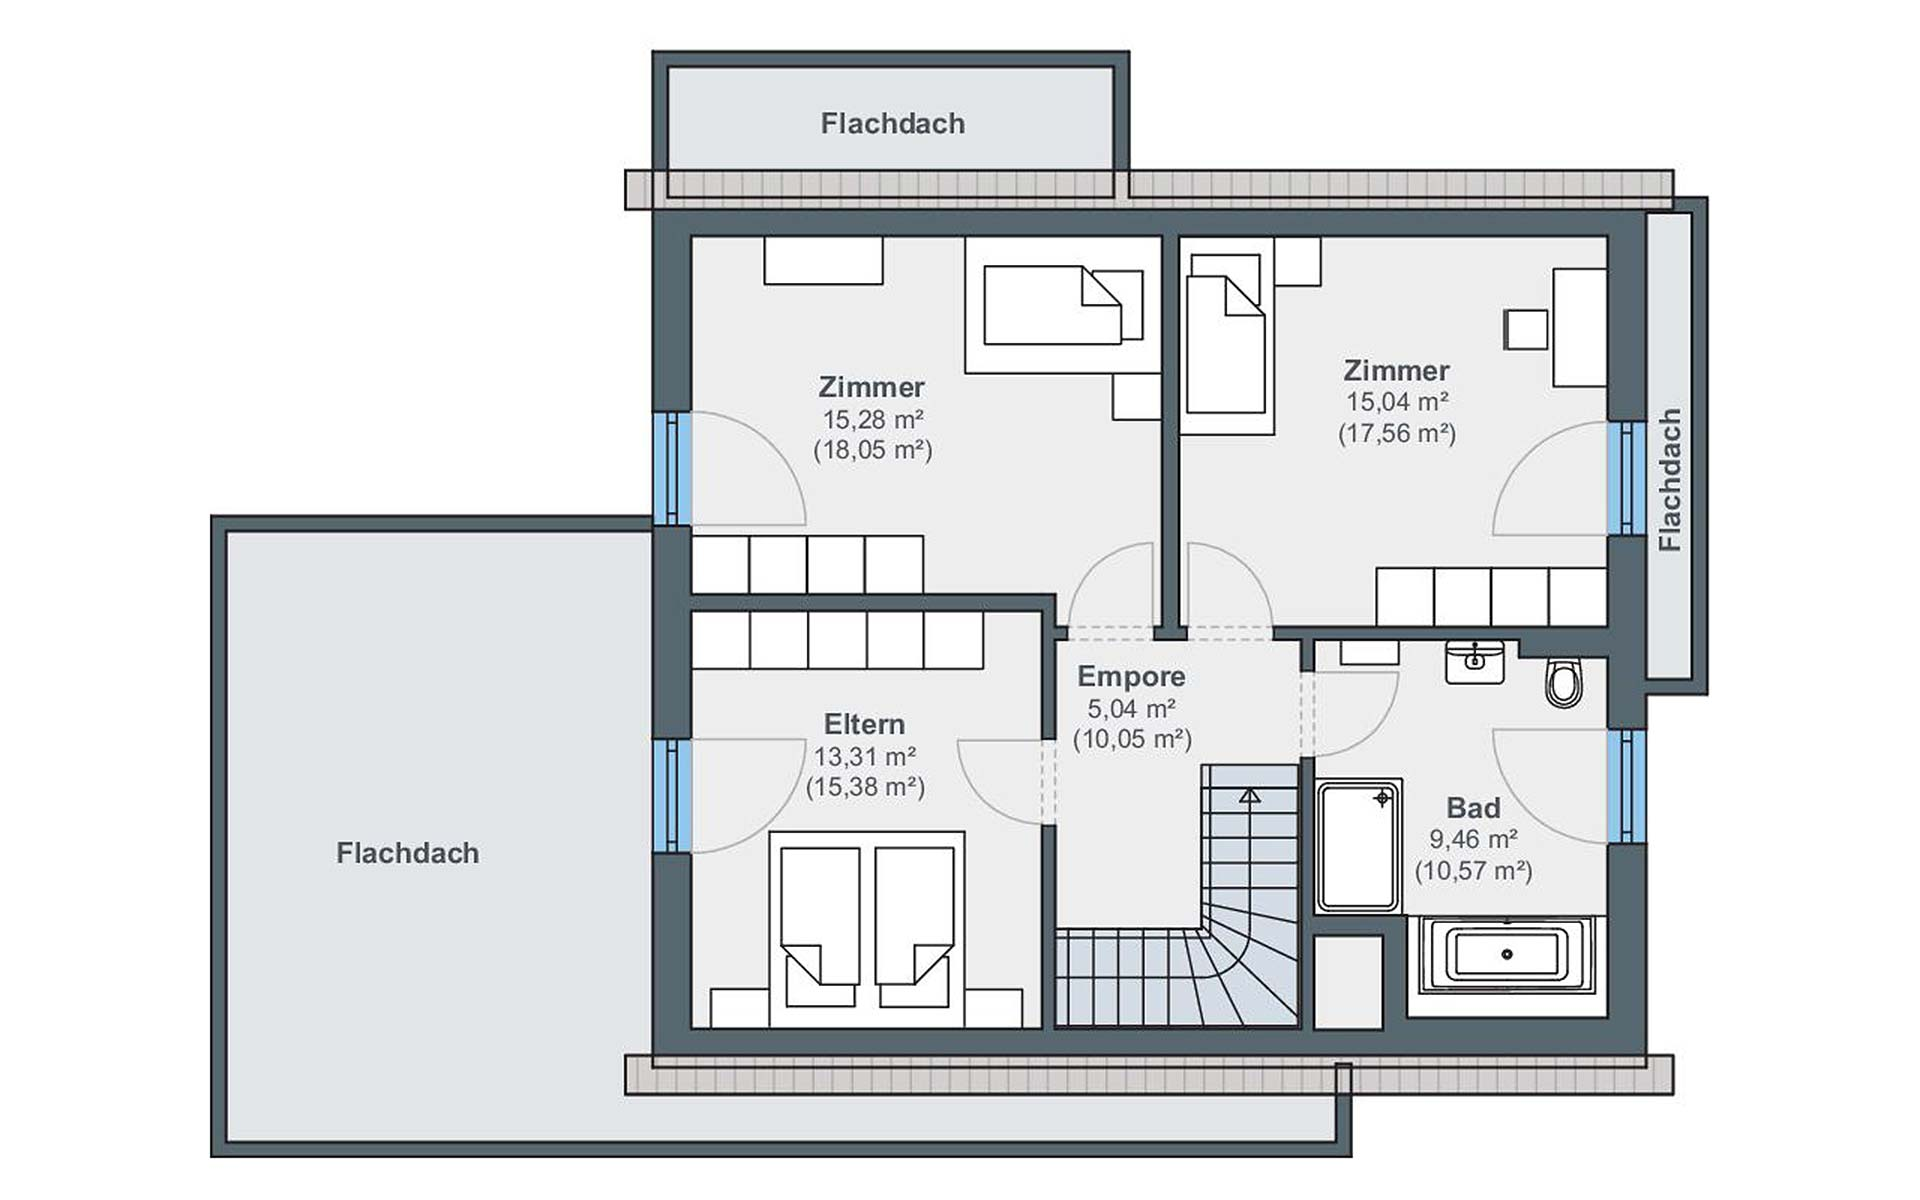 Dachgeschoss Ausstellungshaus Wenden-Hünsborn generation5.5, Haus 110 von WeberHaus GmbH & Co. KG